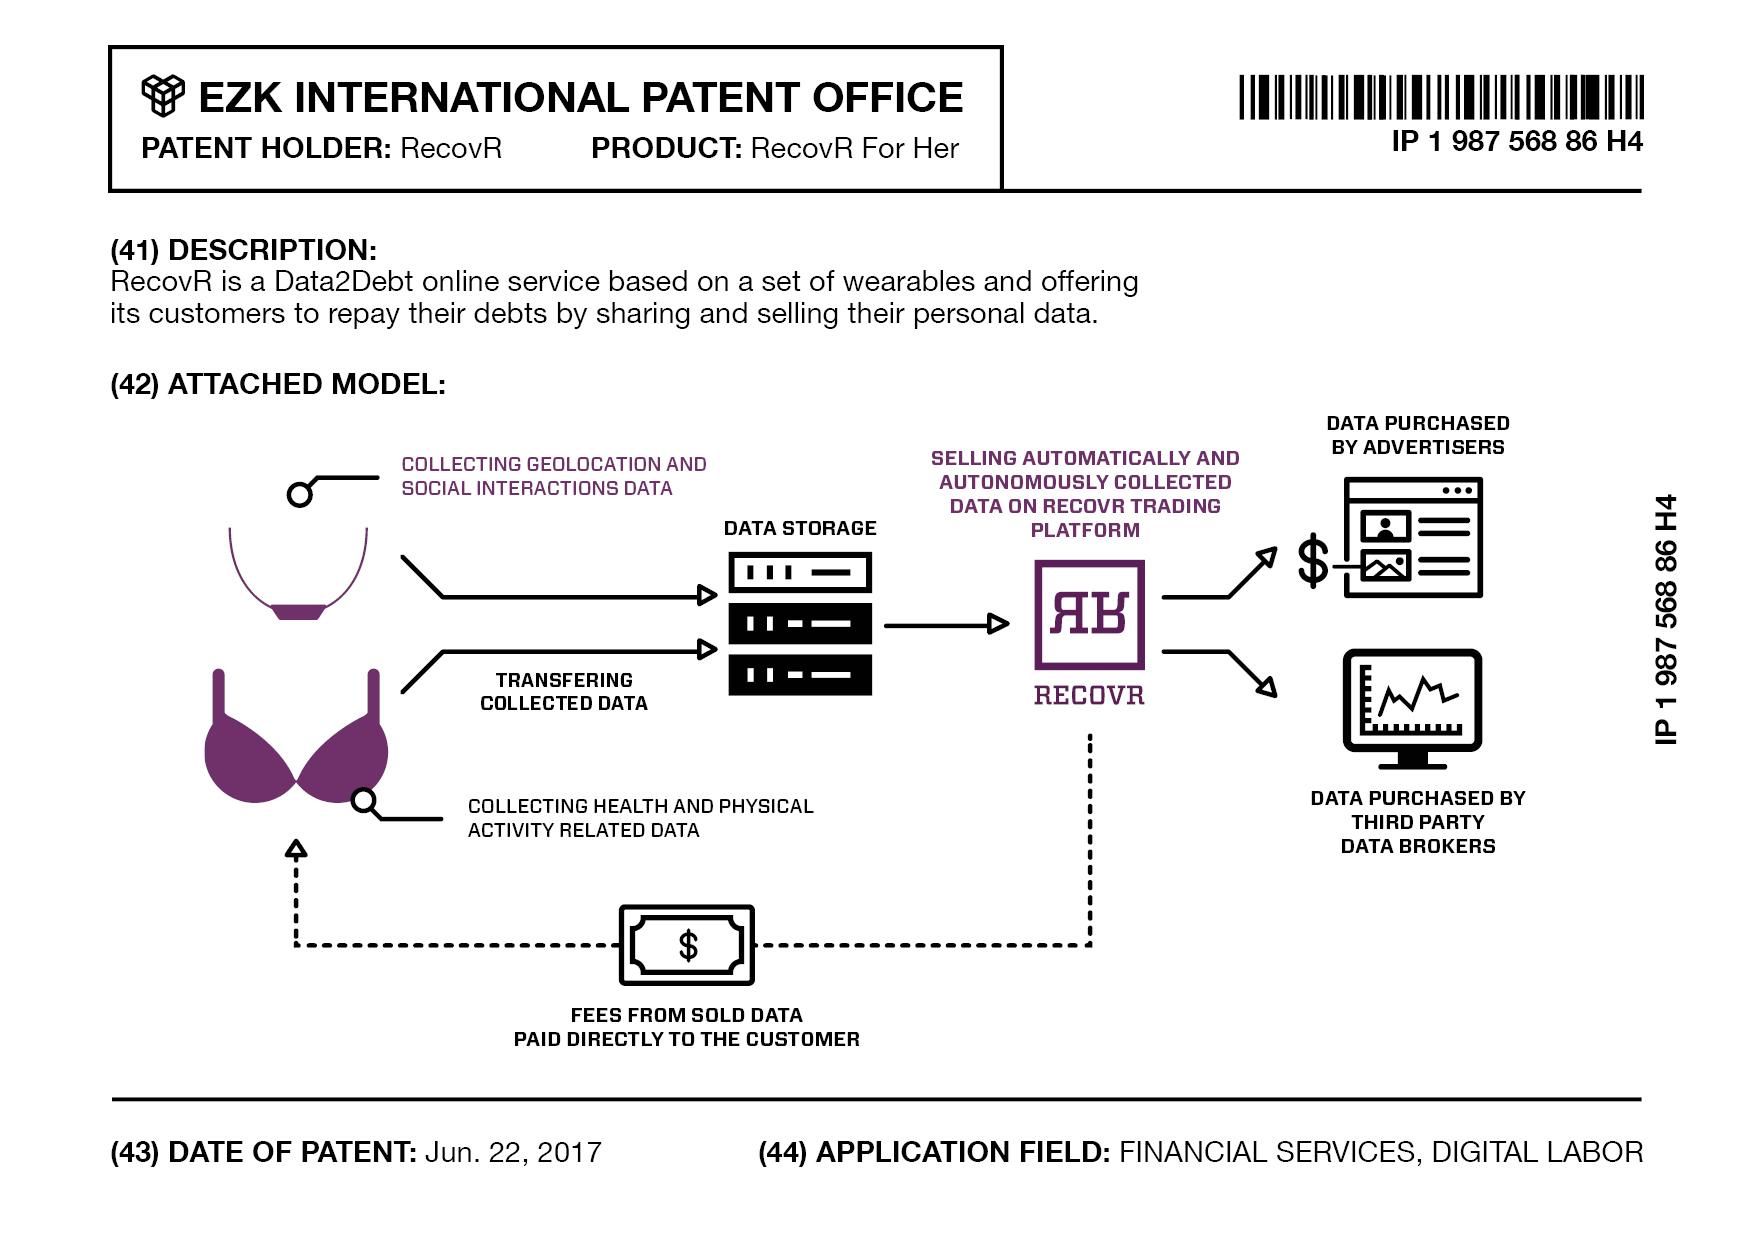 RecovR patent